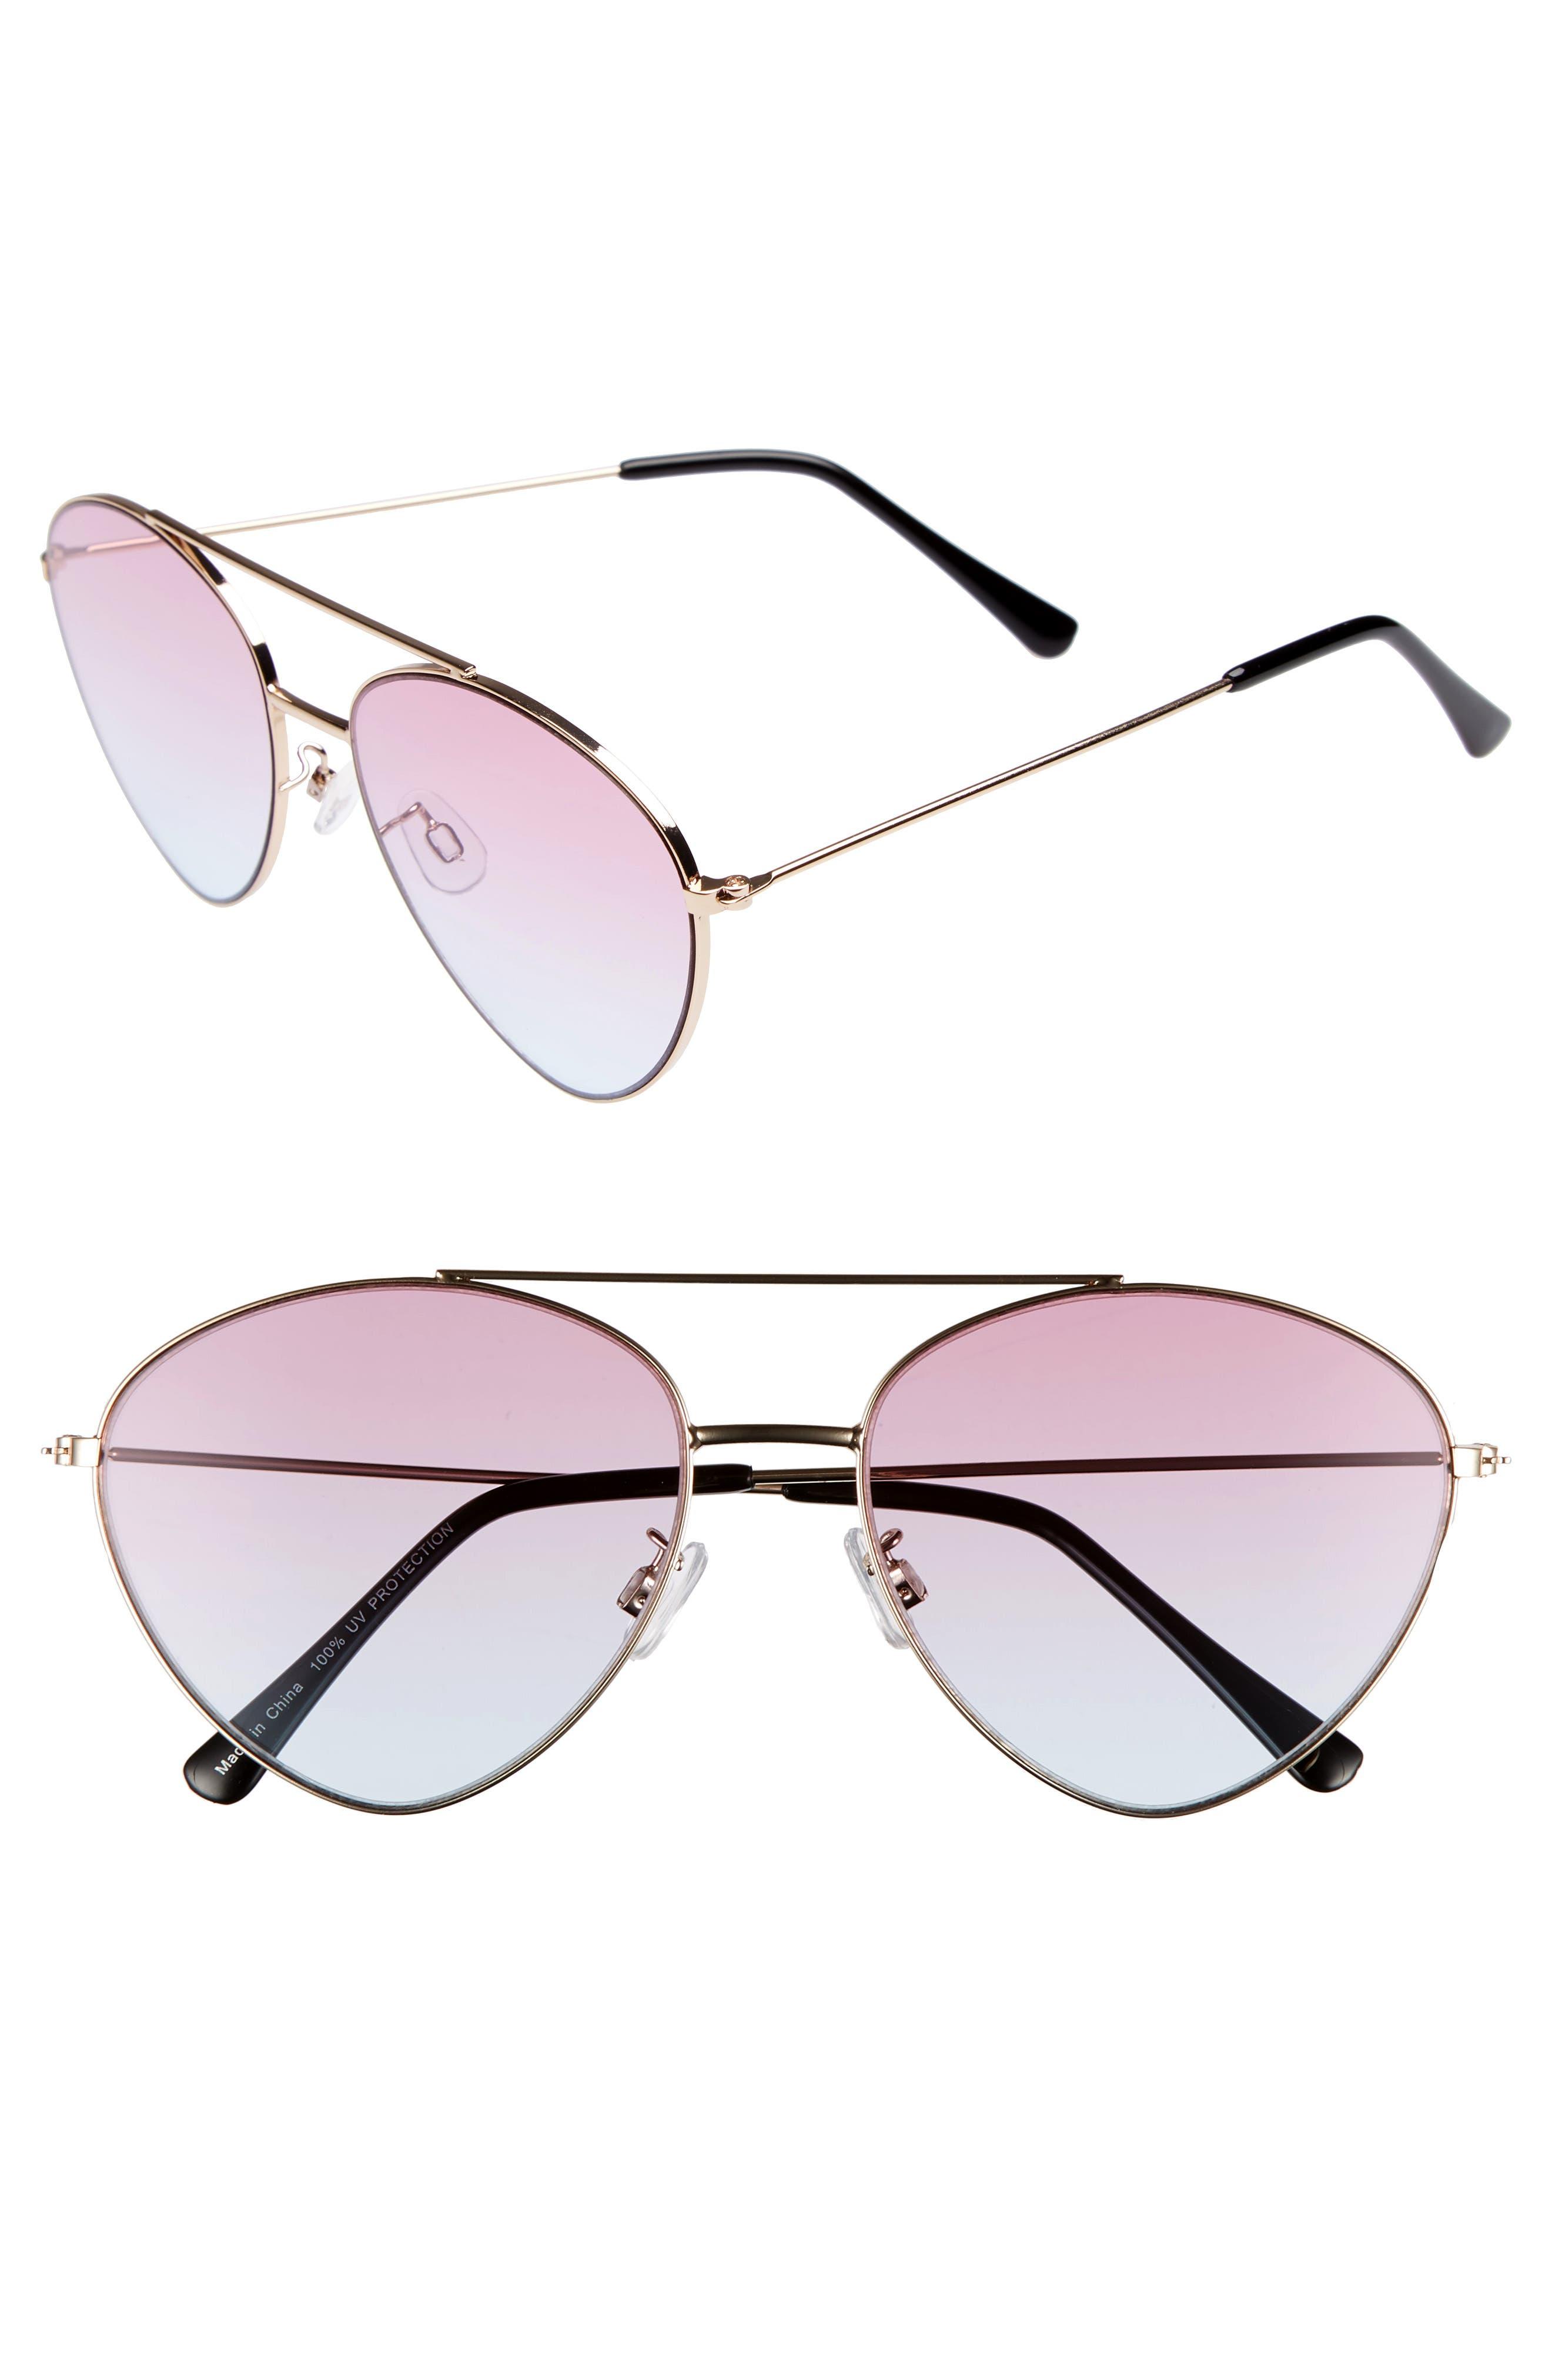 56mm Gradient Aviator Sunglasses,                         Main,                         color, Gold/ Pink/ Blue